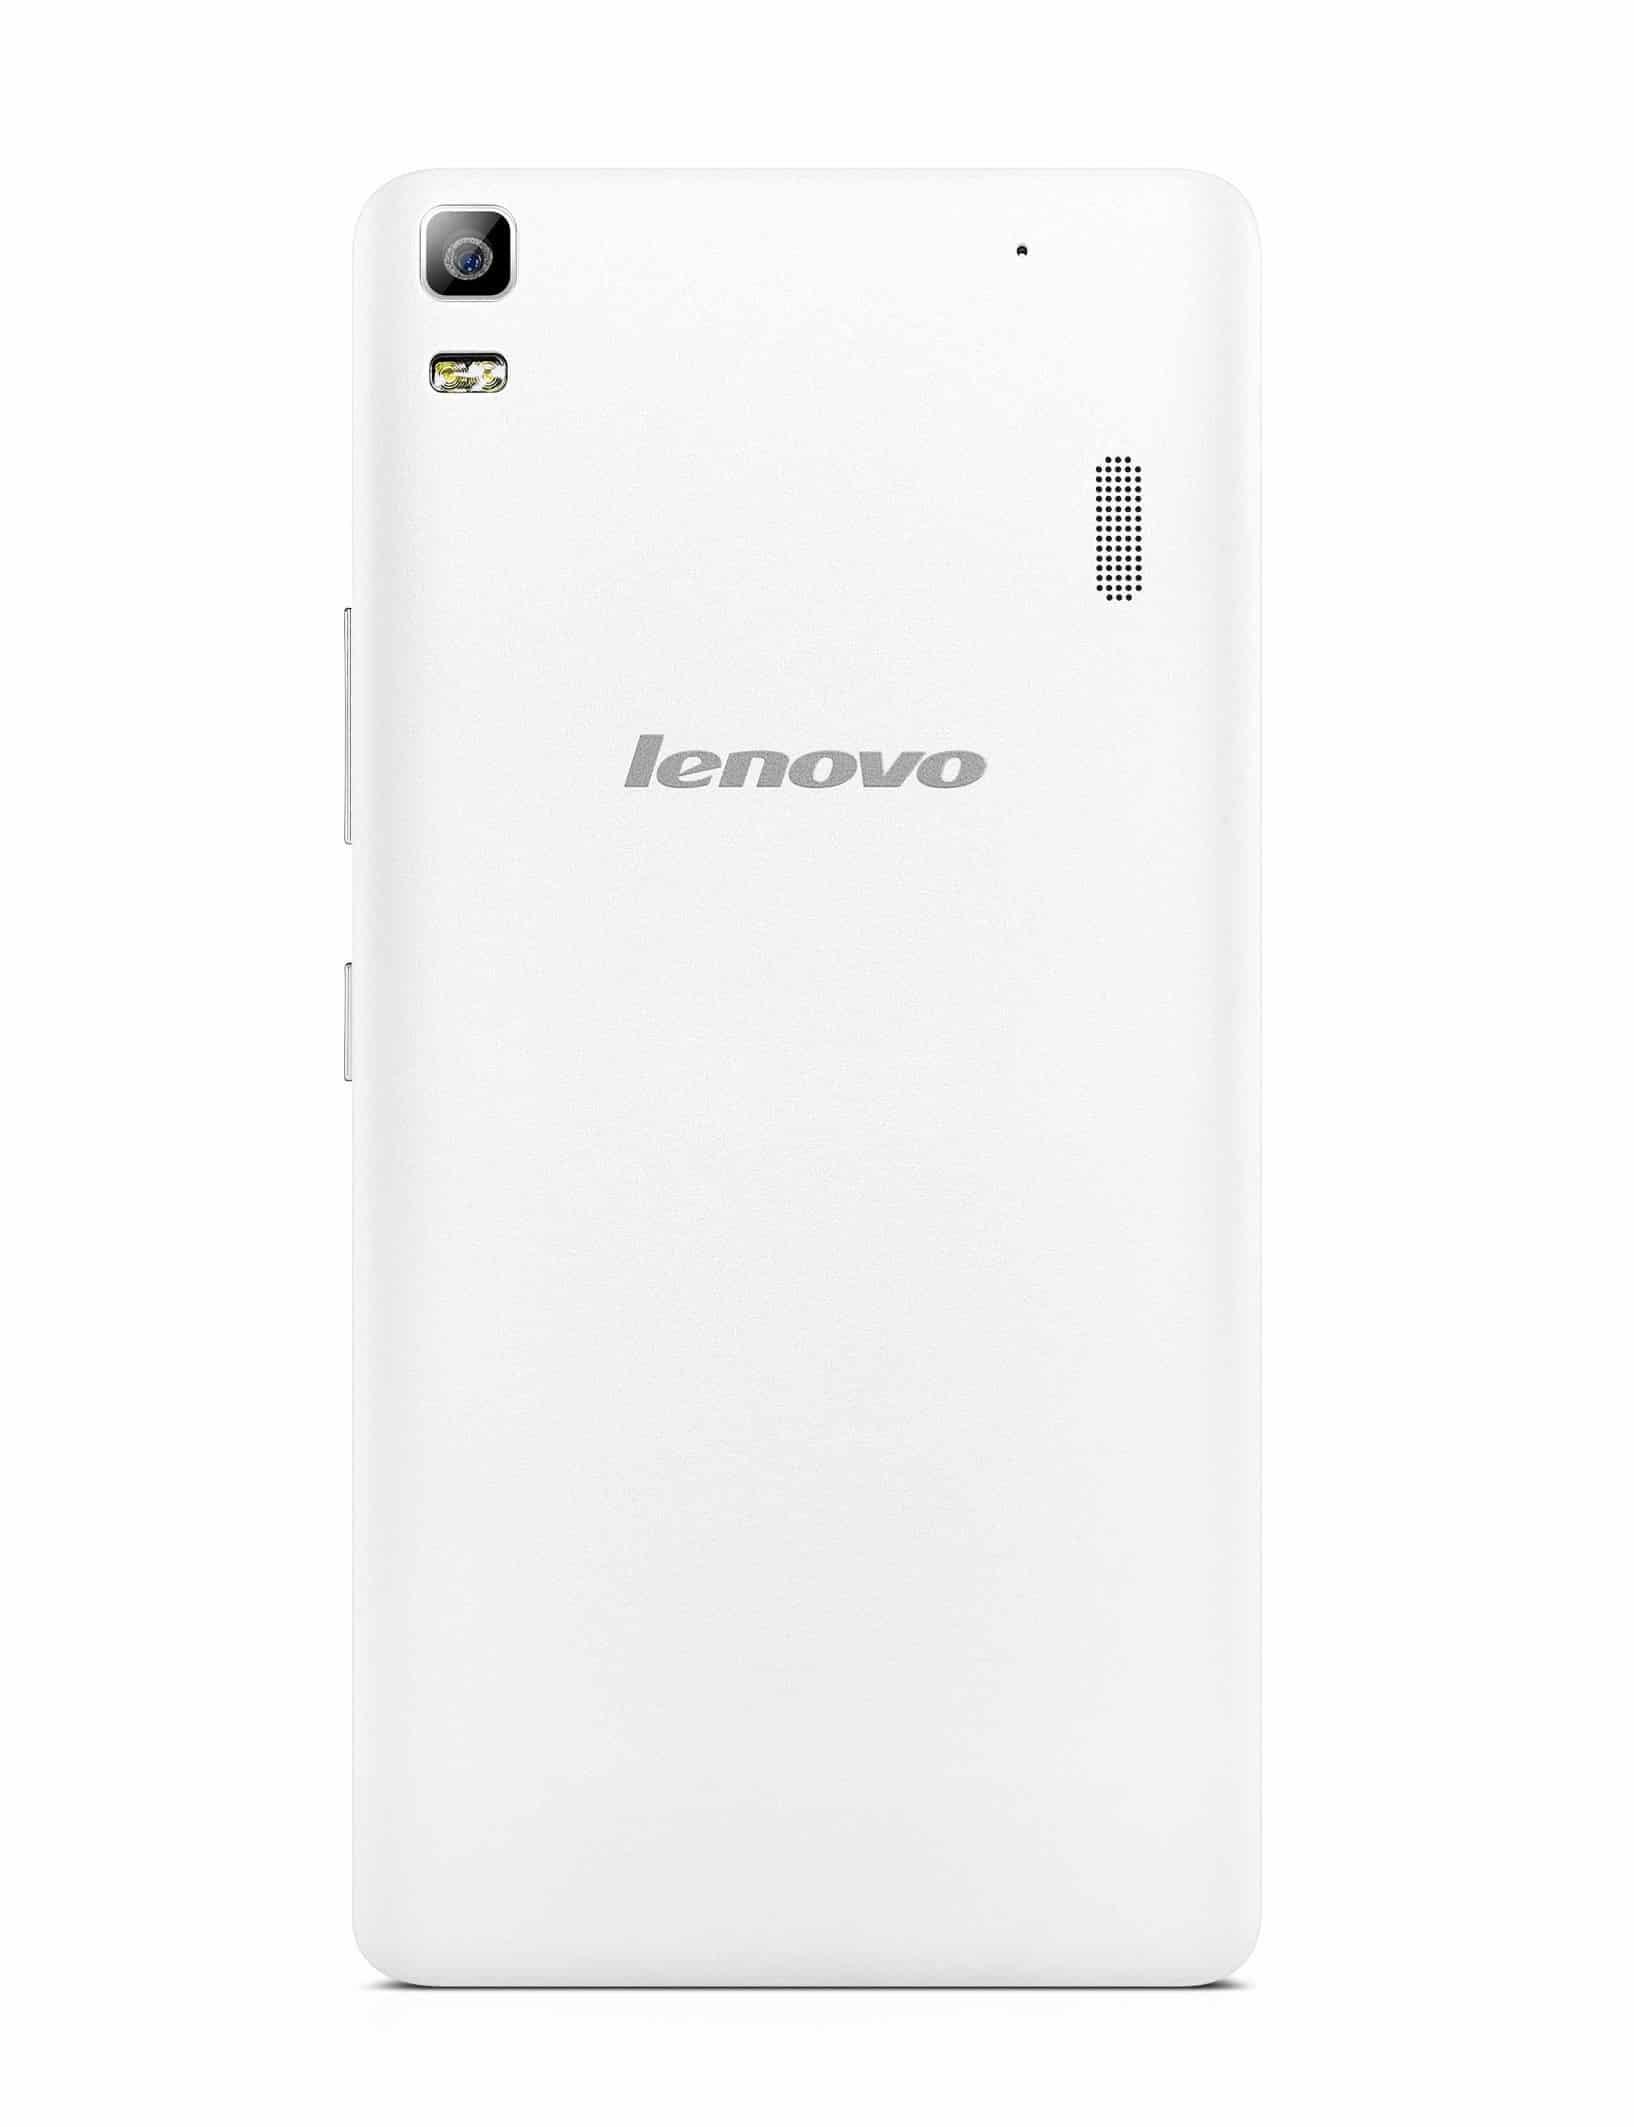 Lenovo A7000 under RM750